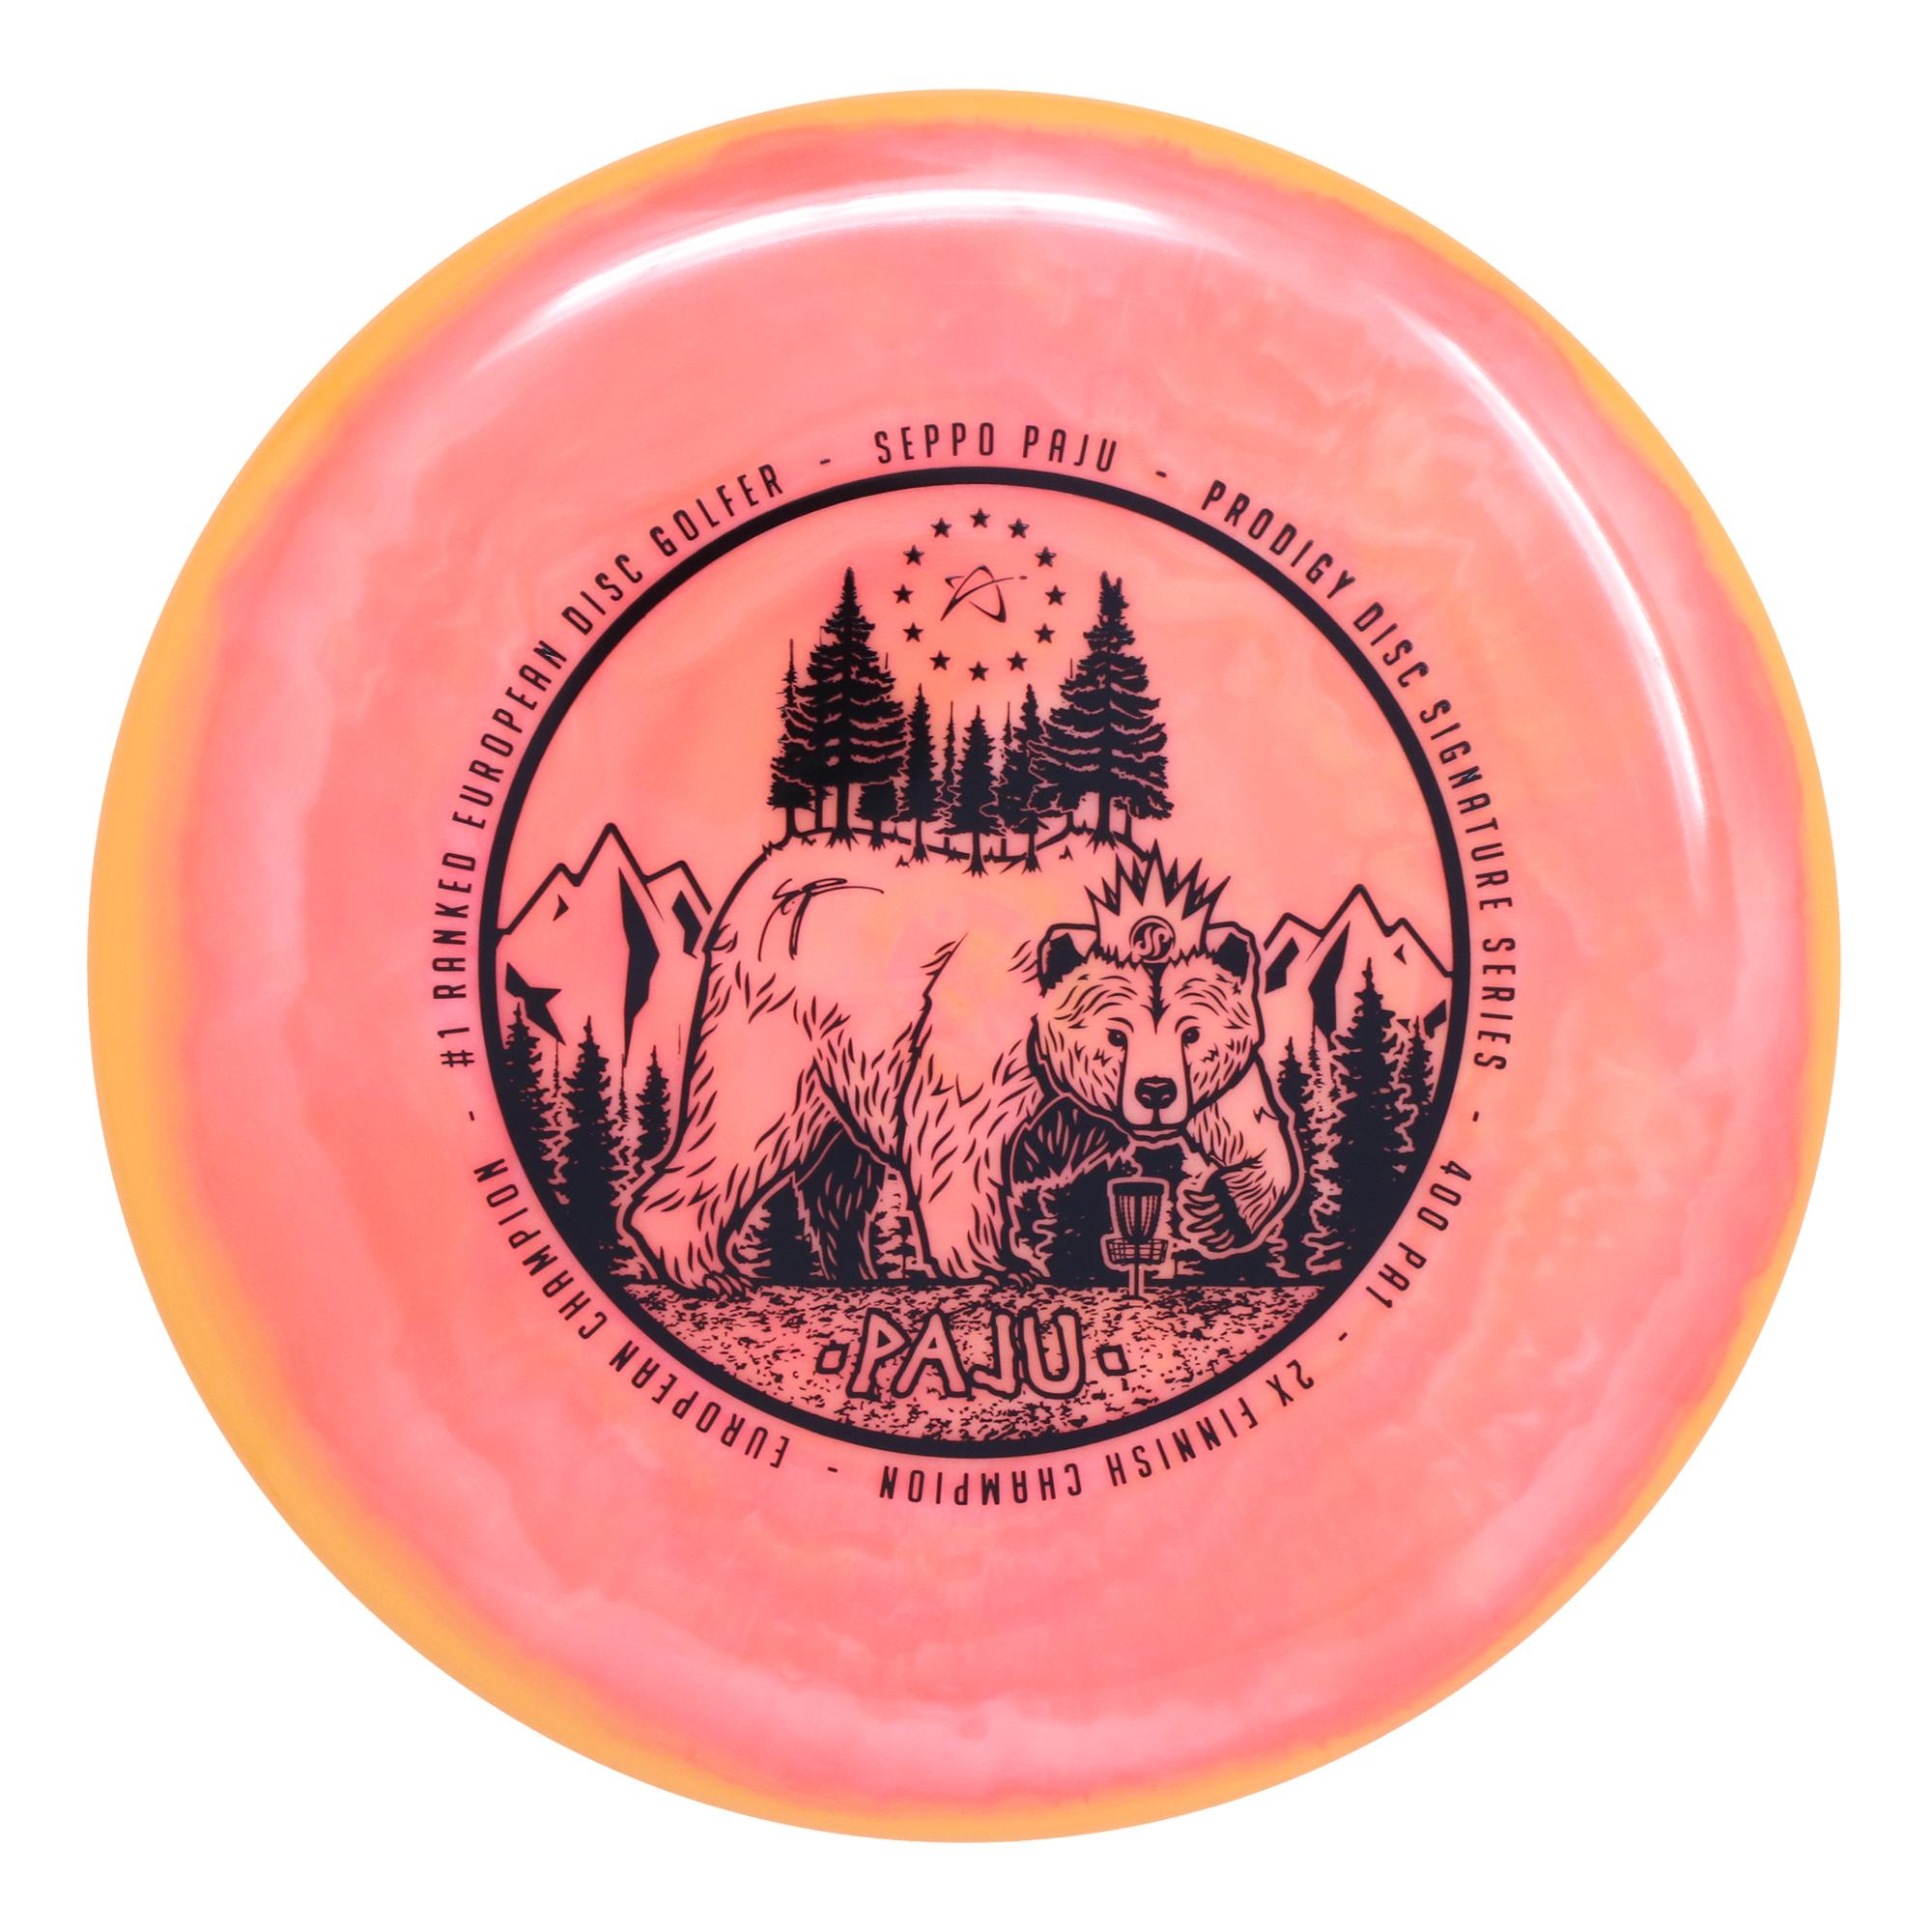 prodigy-PA-1-400-seppo-paju-sig_pink.jpg